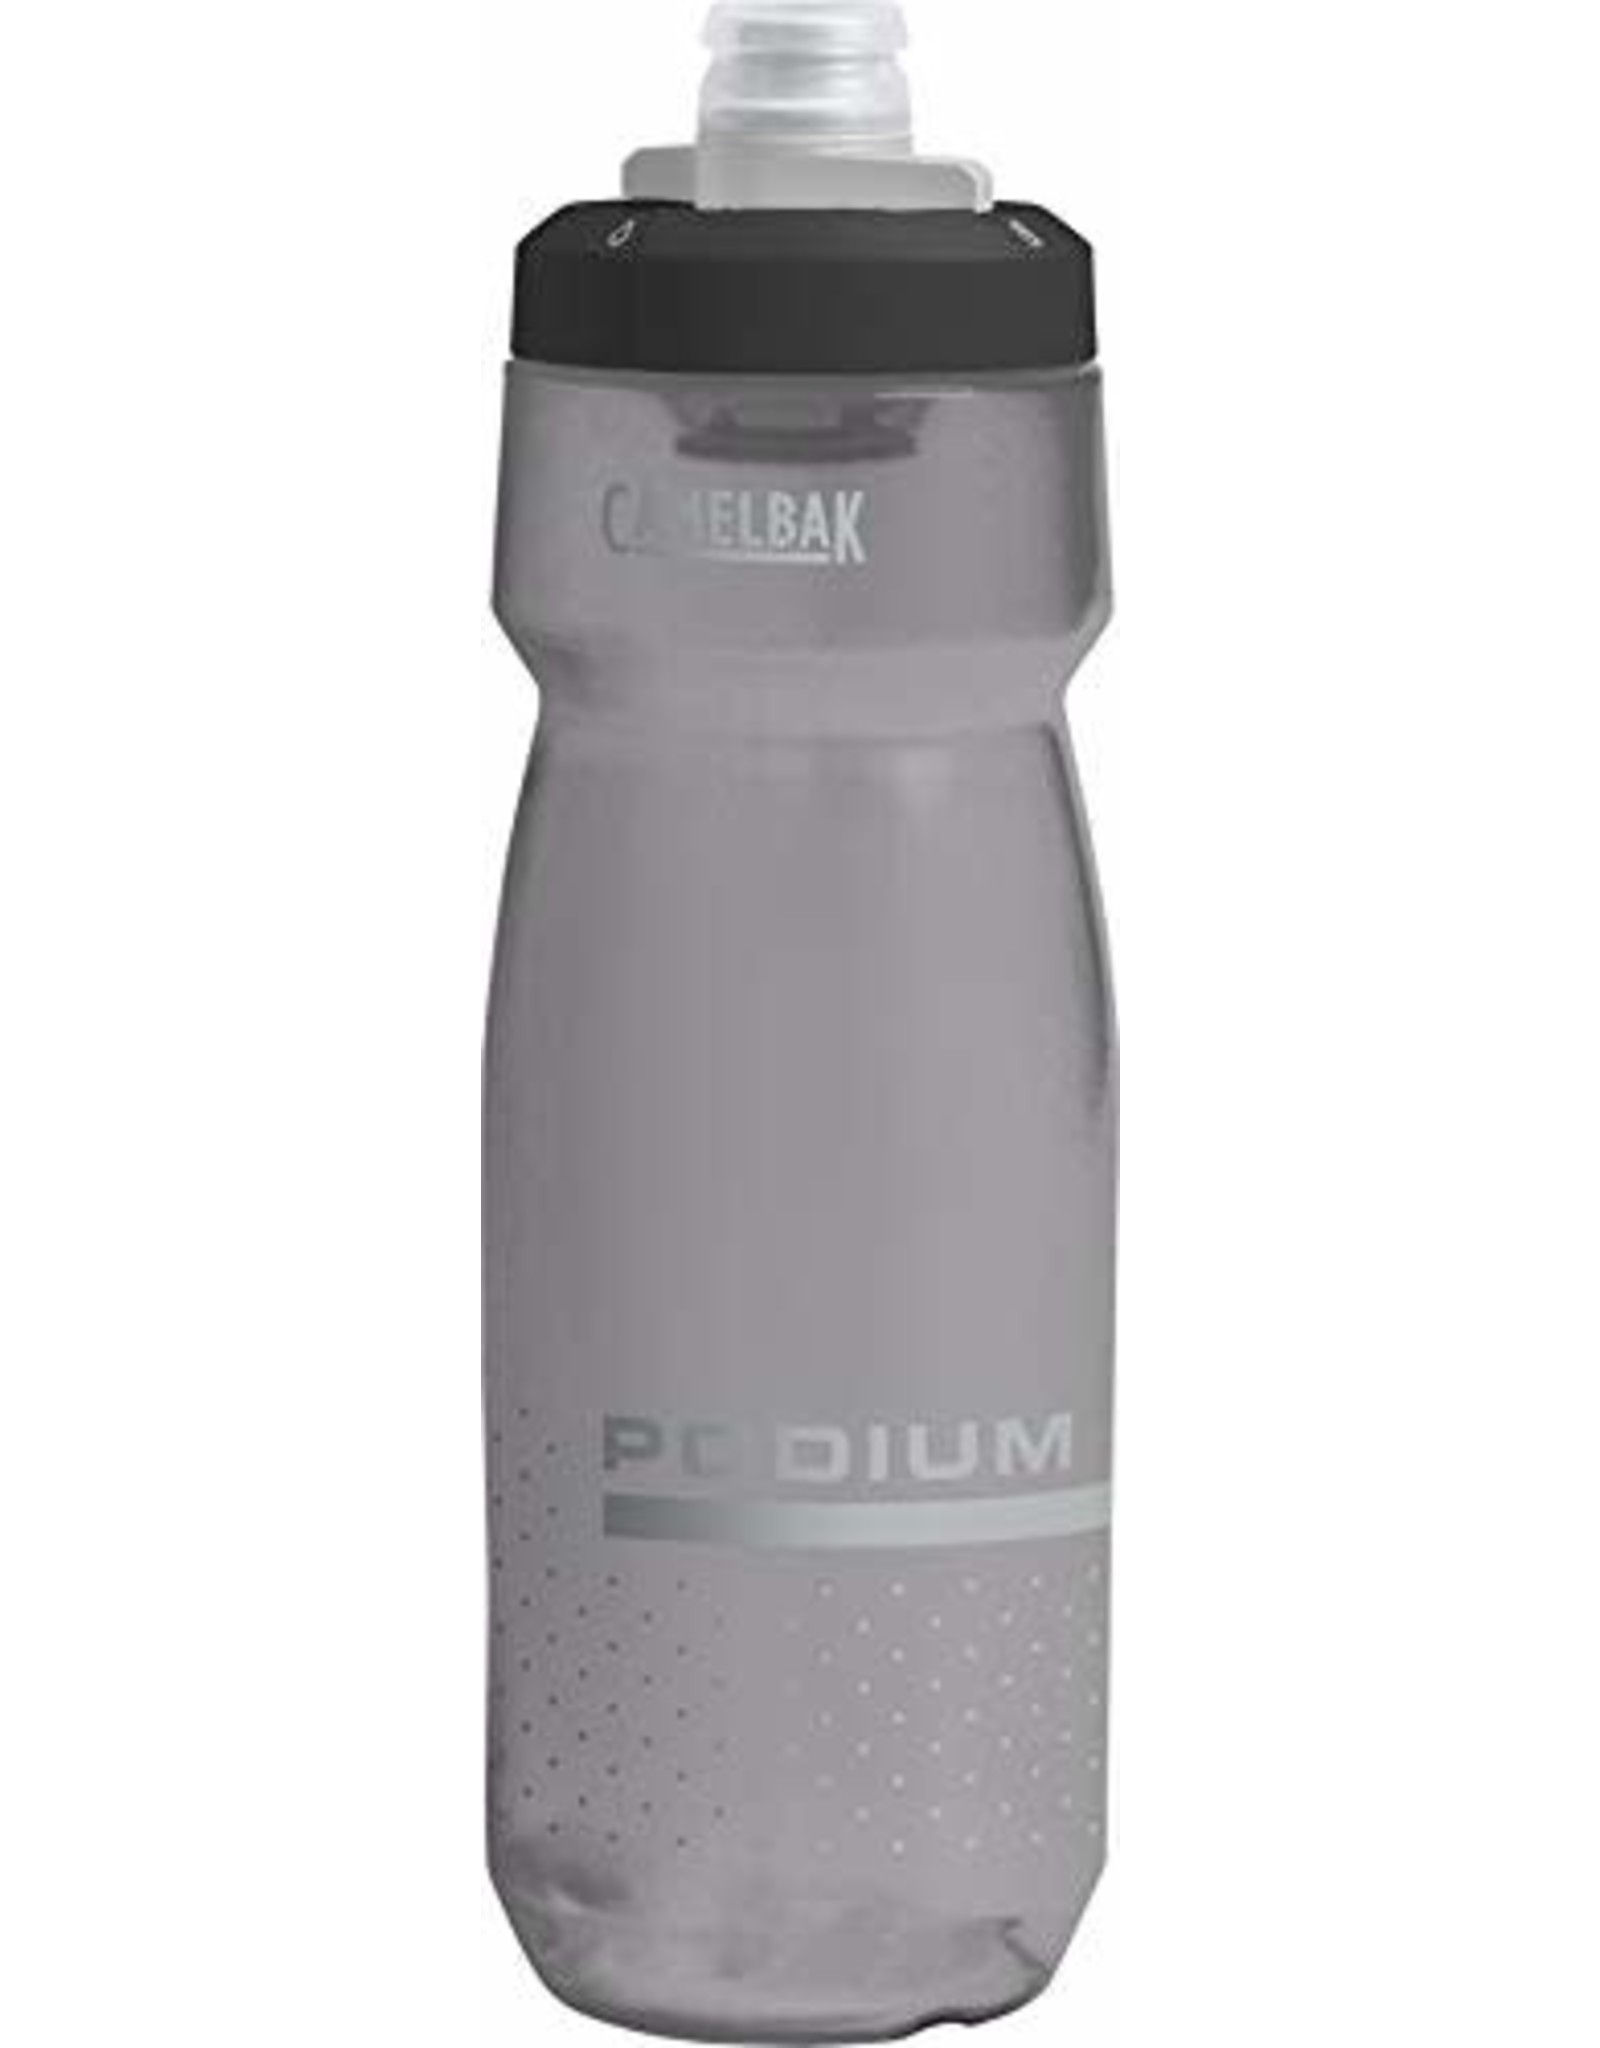 CAMELBAK Podium Bottle, .7L - Smoke